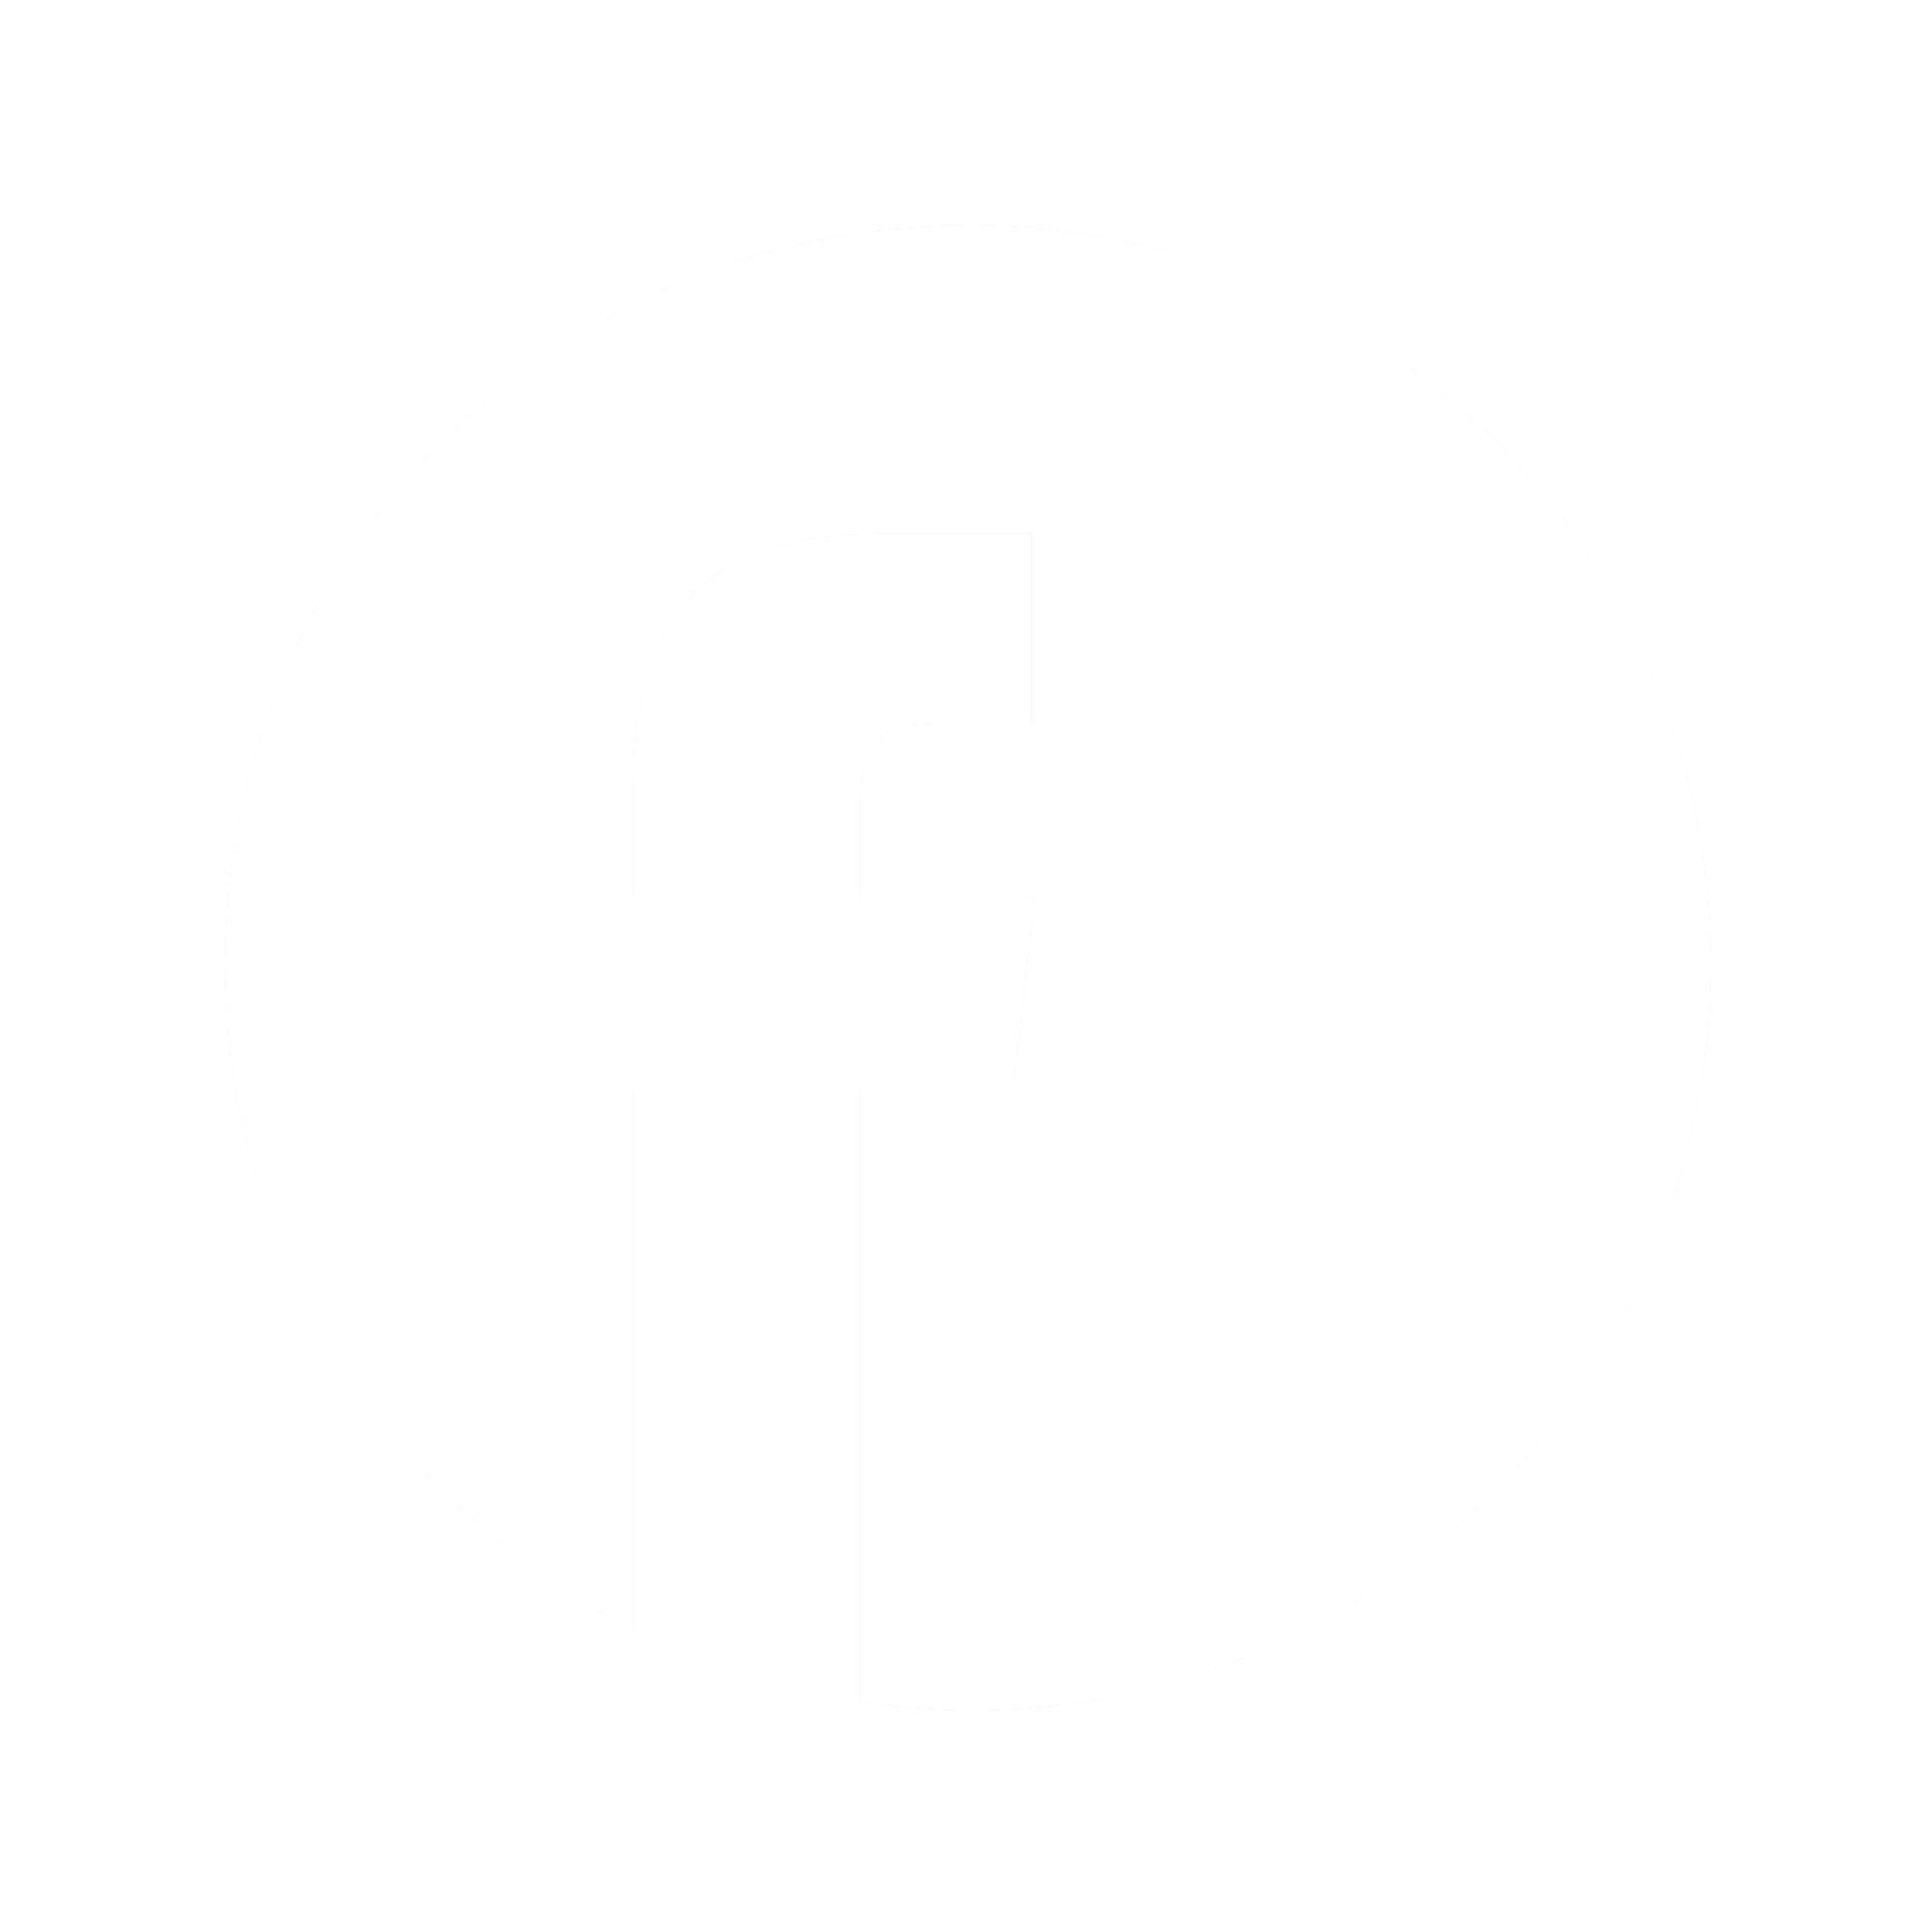 HD Fb White Round Icon Reverse Circle.